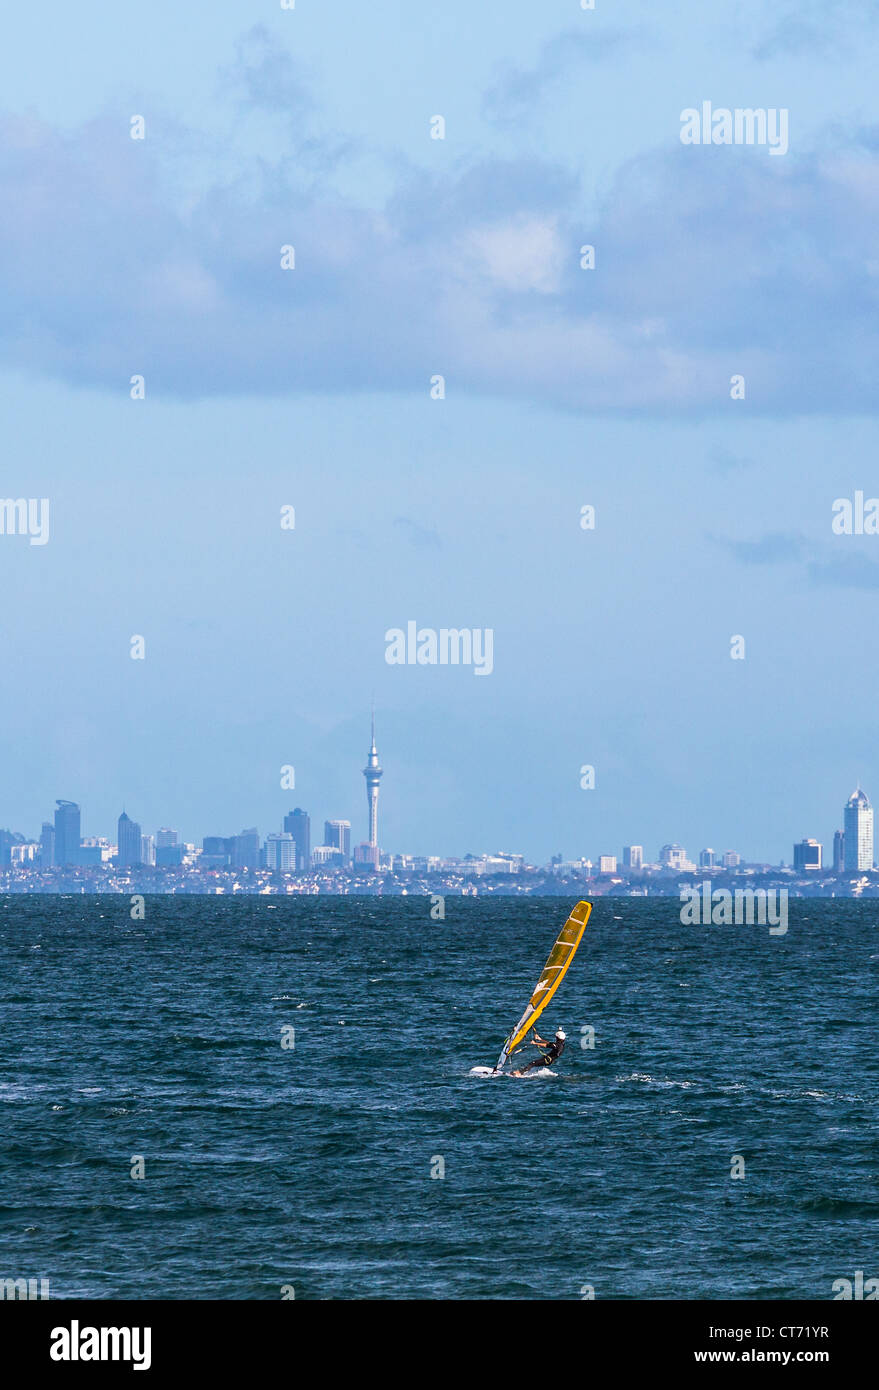 wind surfing cityscape sea sport water - Stock Image